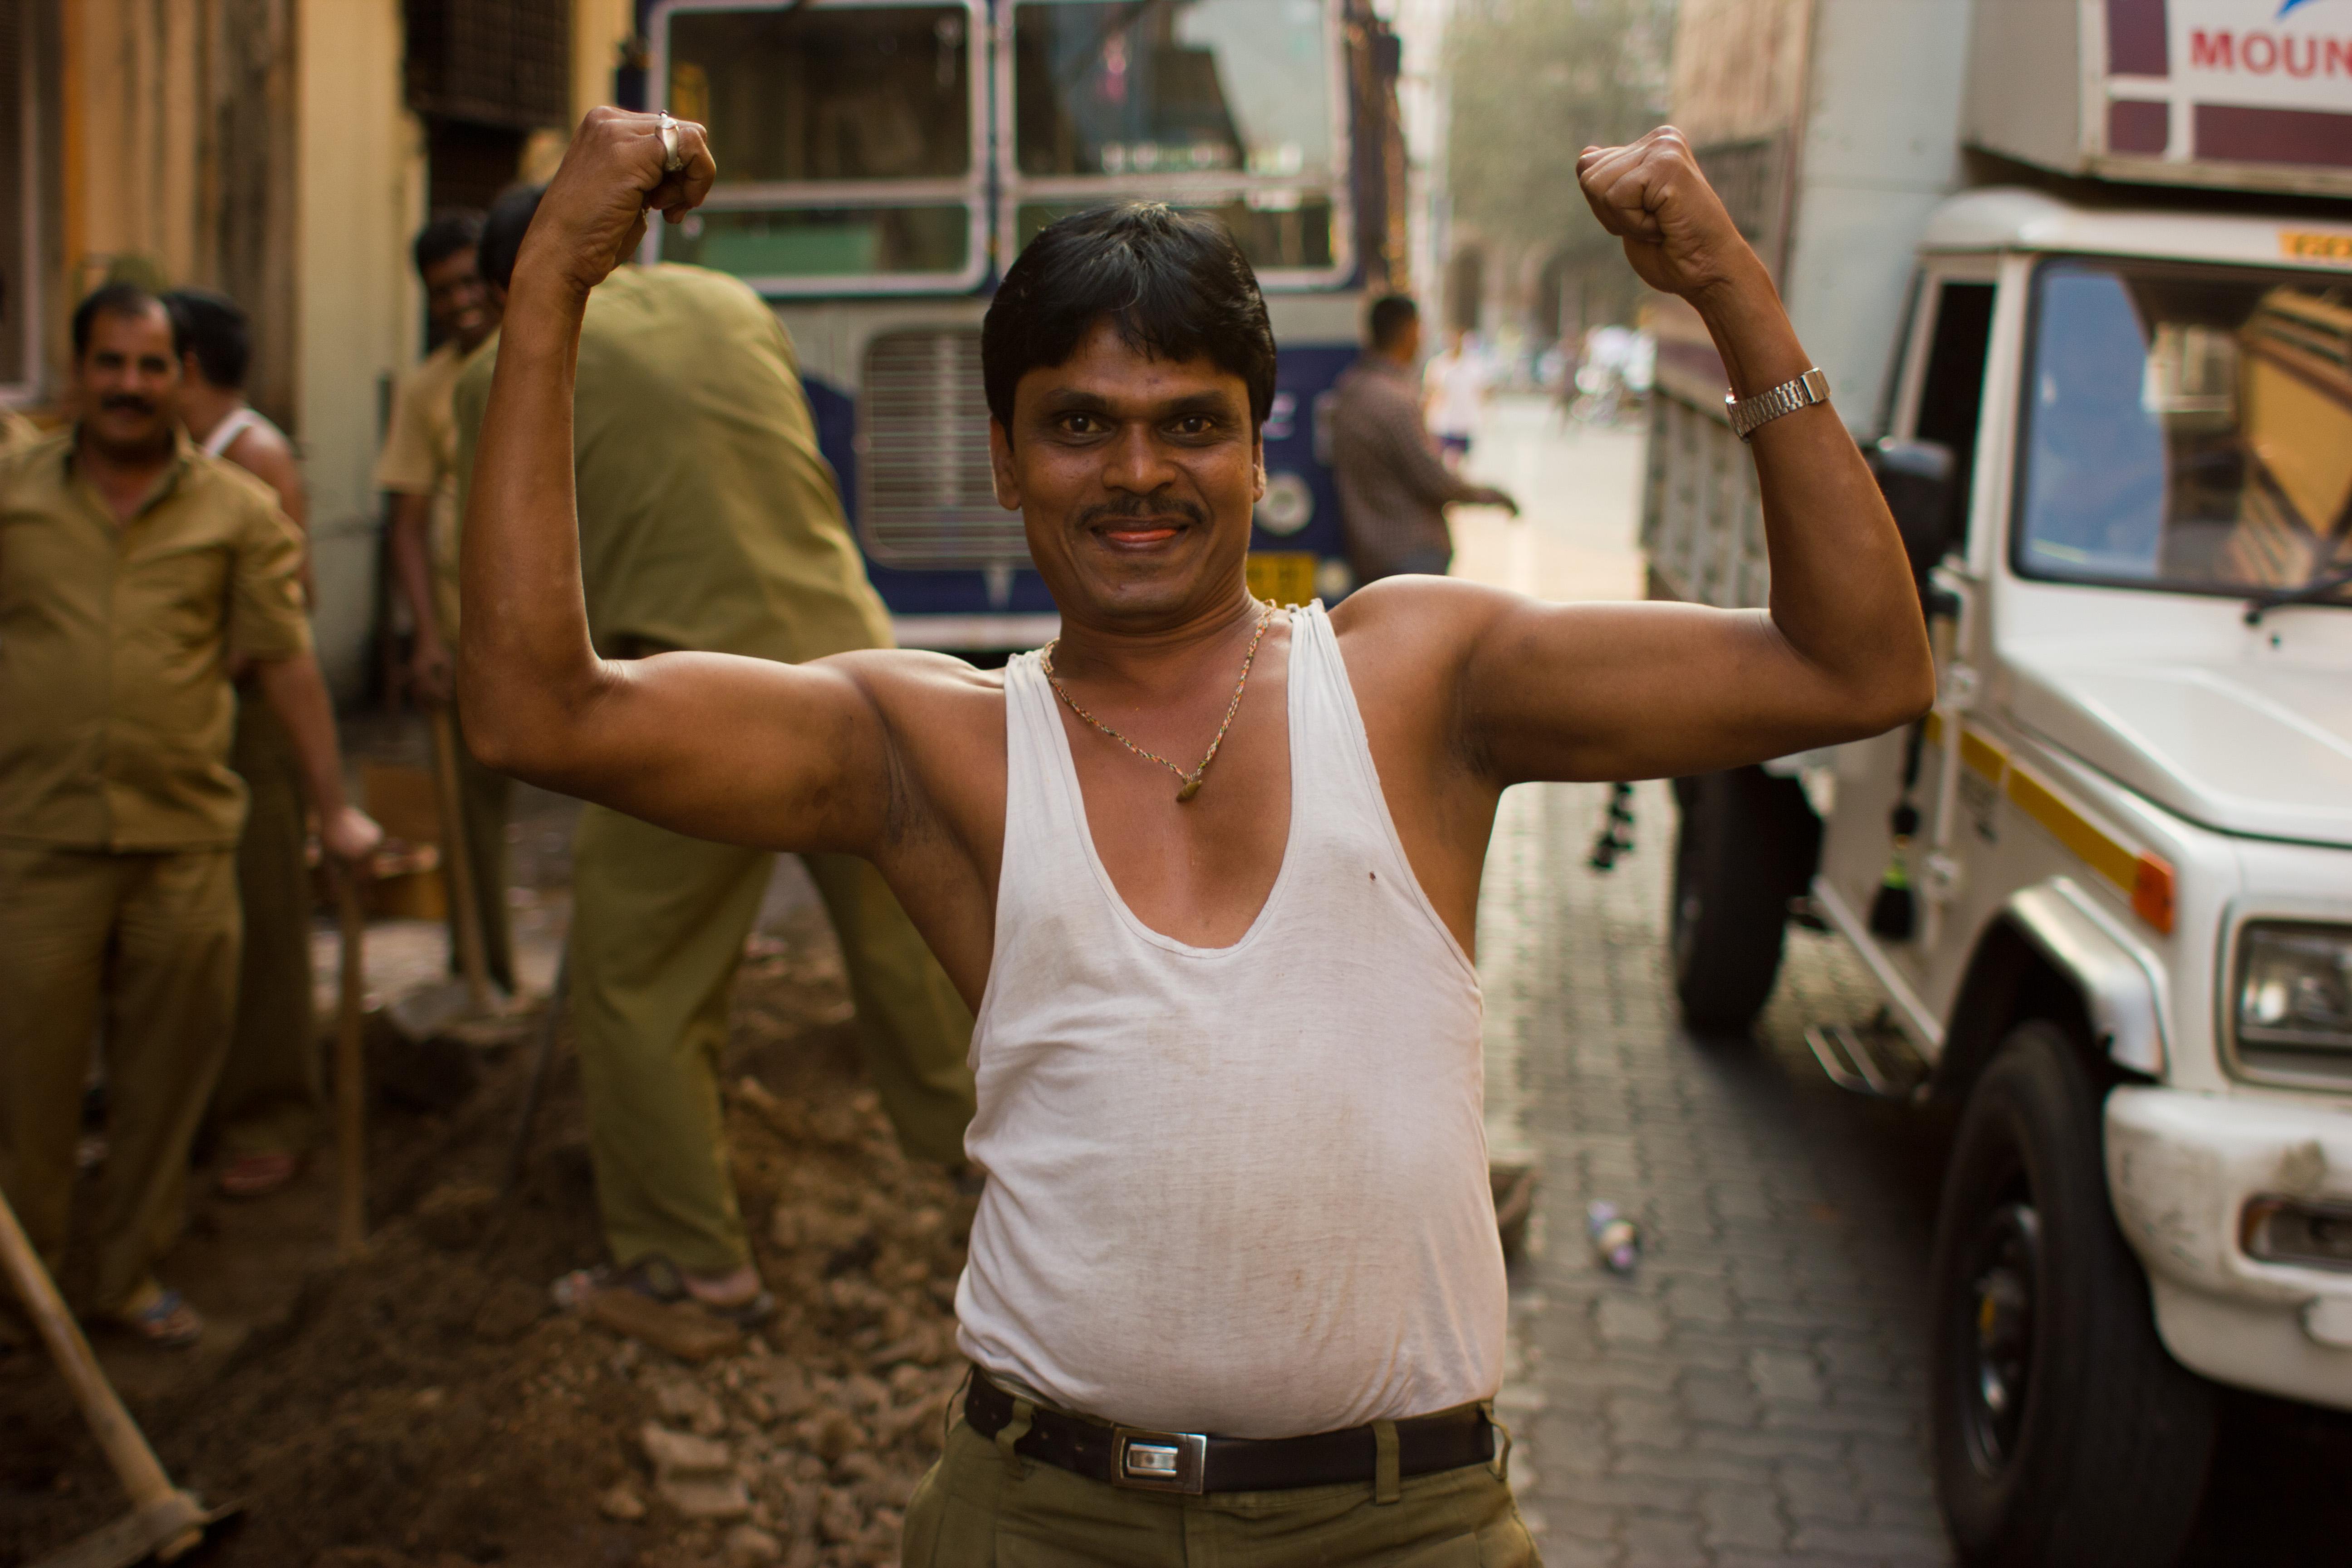 Mumbai_workers_Victor_Grigas_Random_Shots-9.jpg